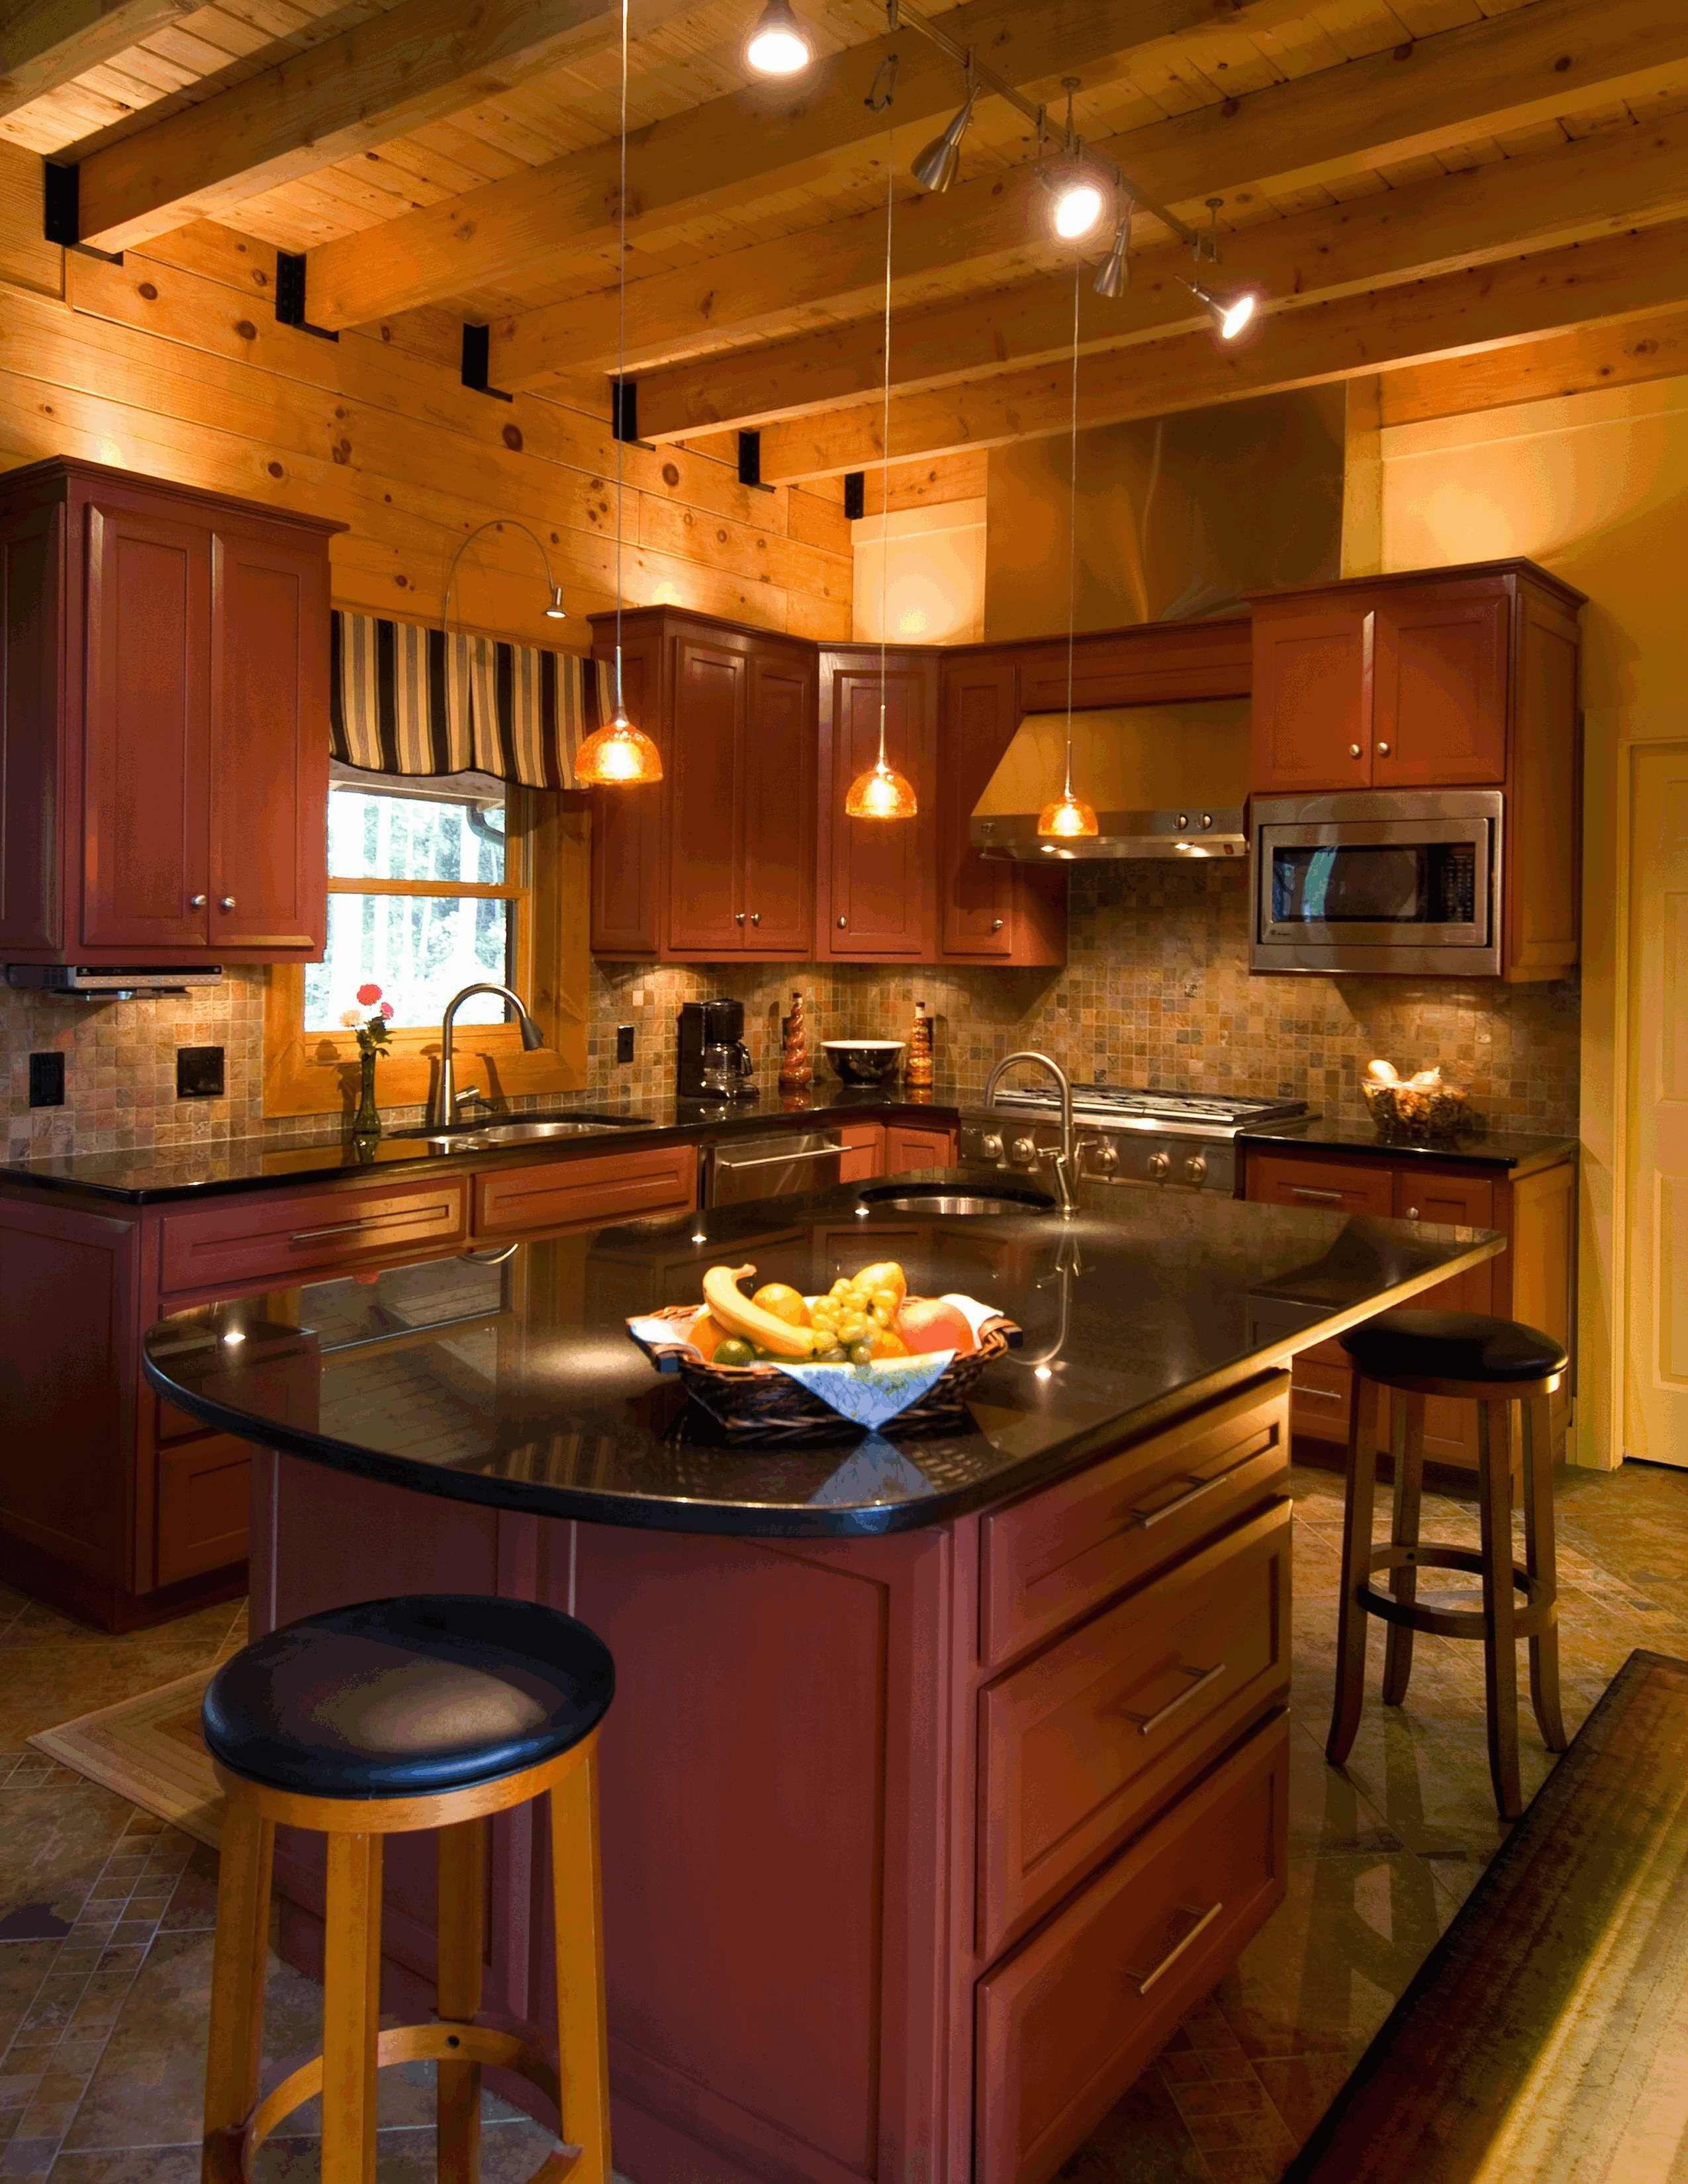 Pin By Lisa Lucabaugh Buckwalter On Log Cabin Kitchen Ideas Log Home Kitchens Log Cabin Kitchen Log Home Kitchen